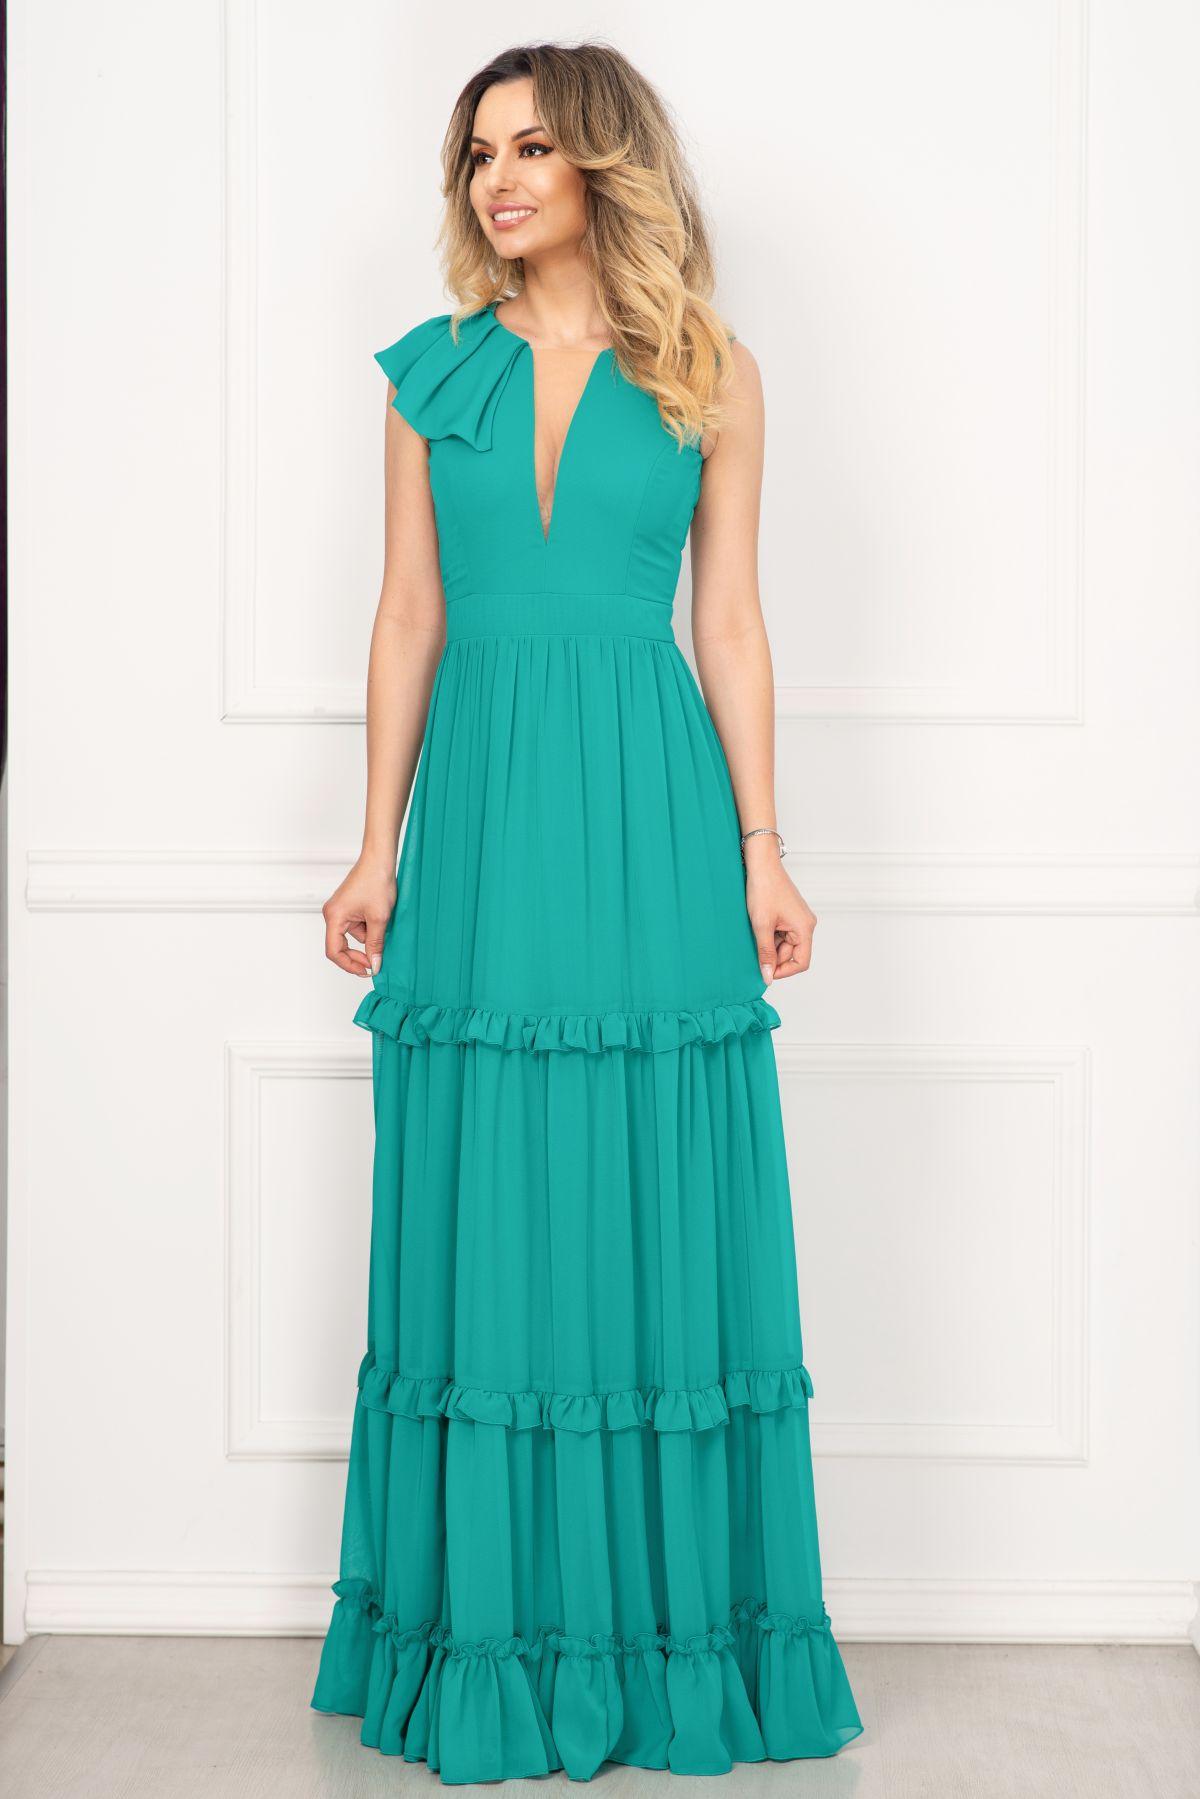 Rochie de seara Fofy turquoise cu volane